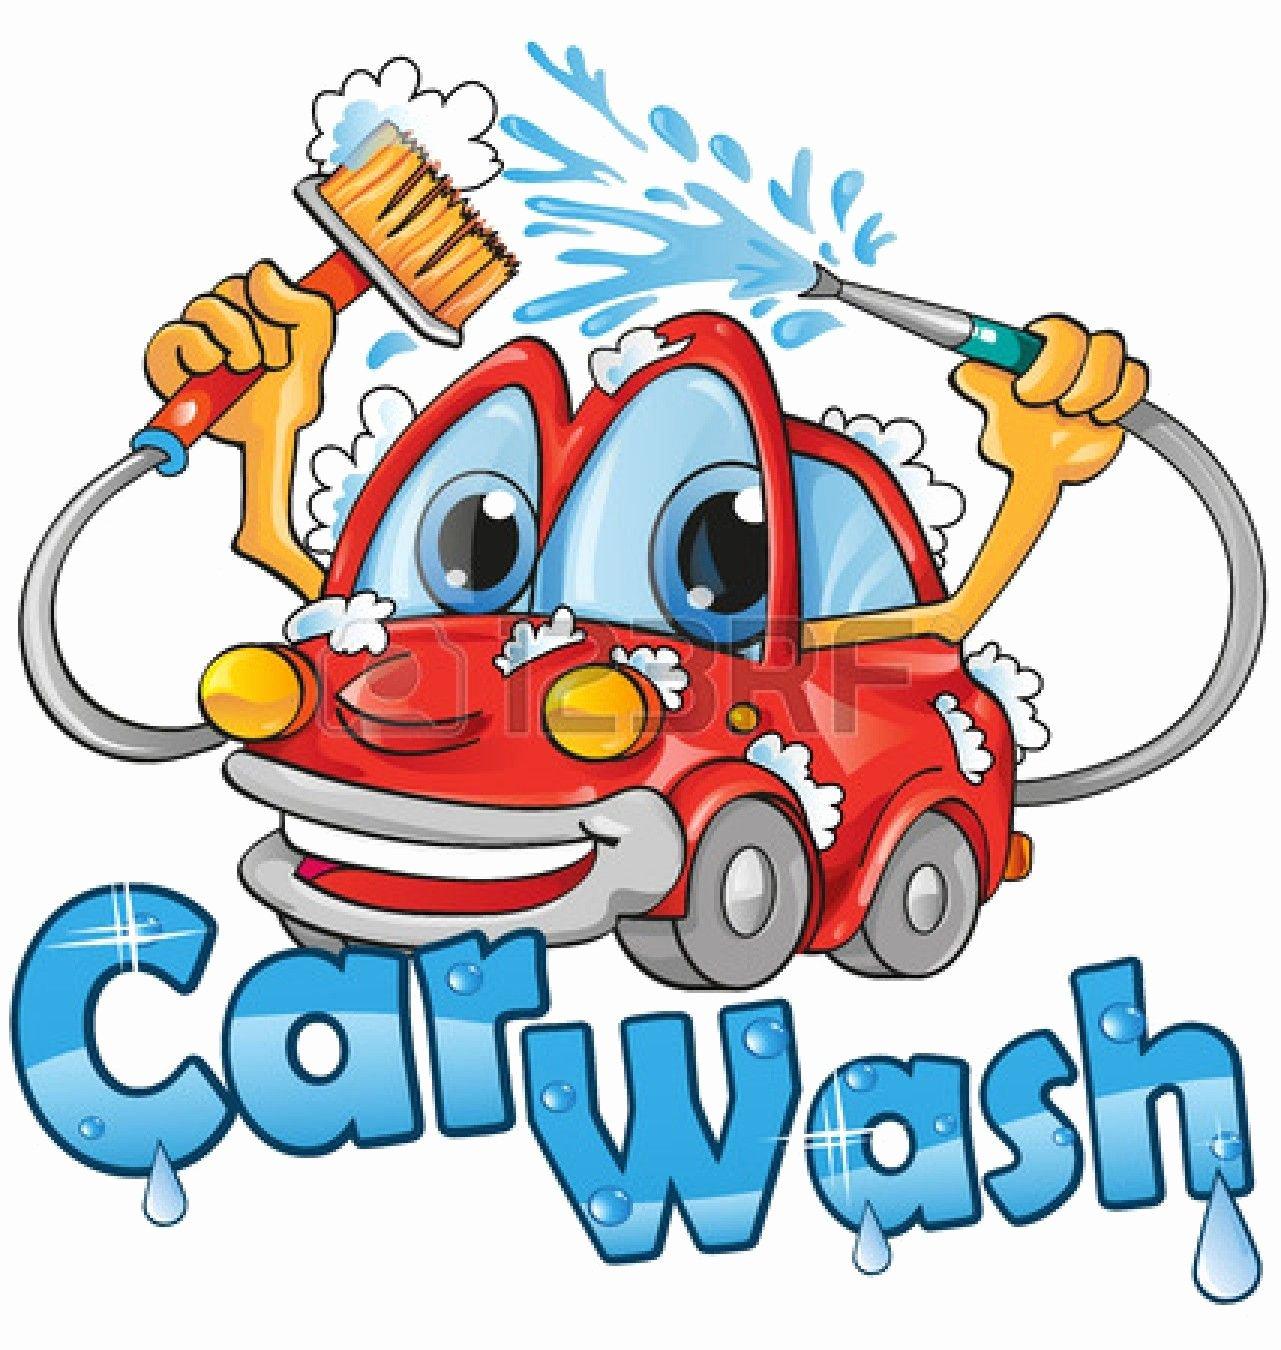 Car Wash Fundraiser Template Fresh Car Wash Fundraiser Car Wash Fundraiser Clipart